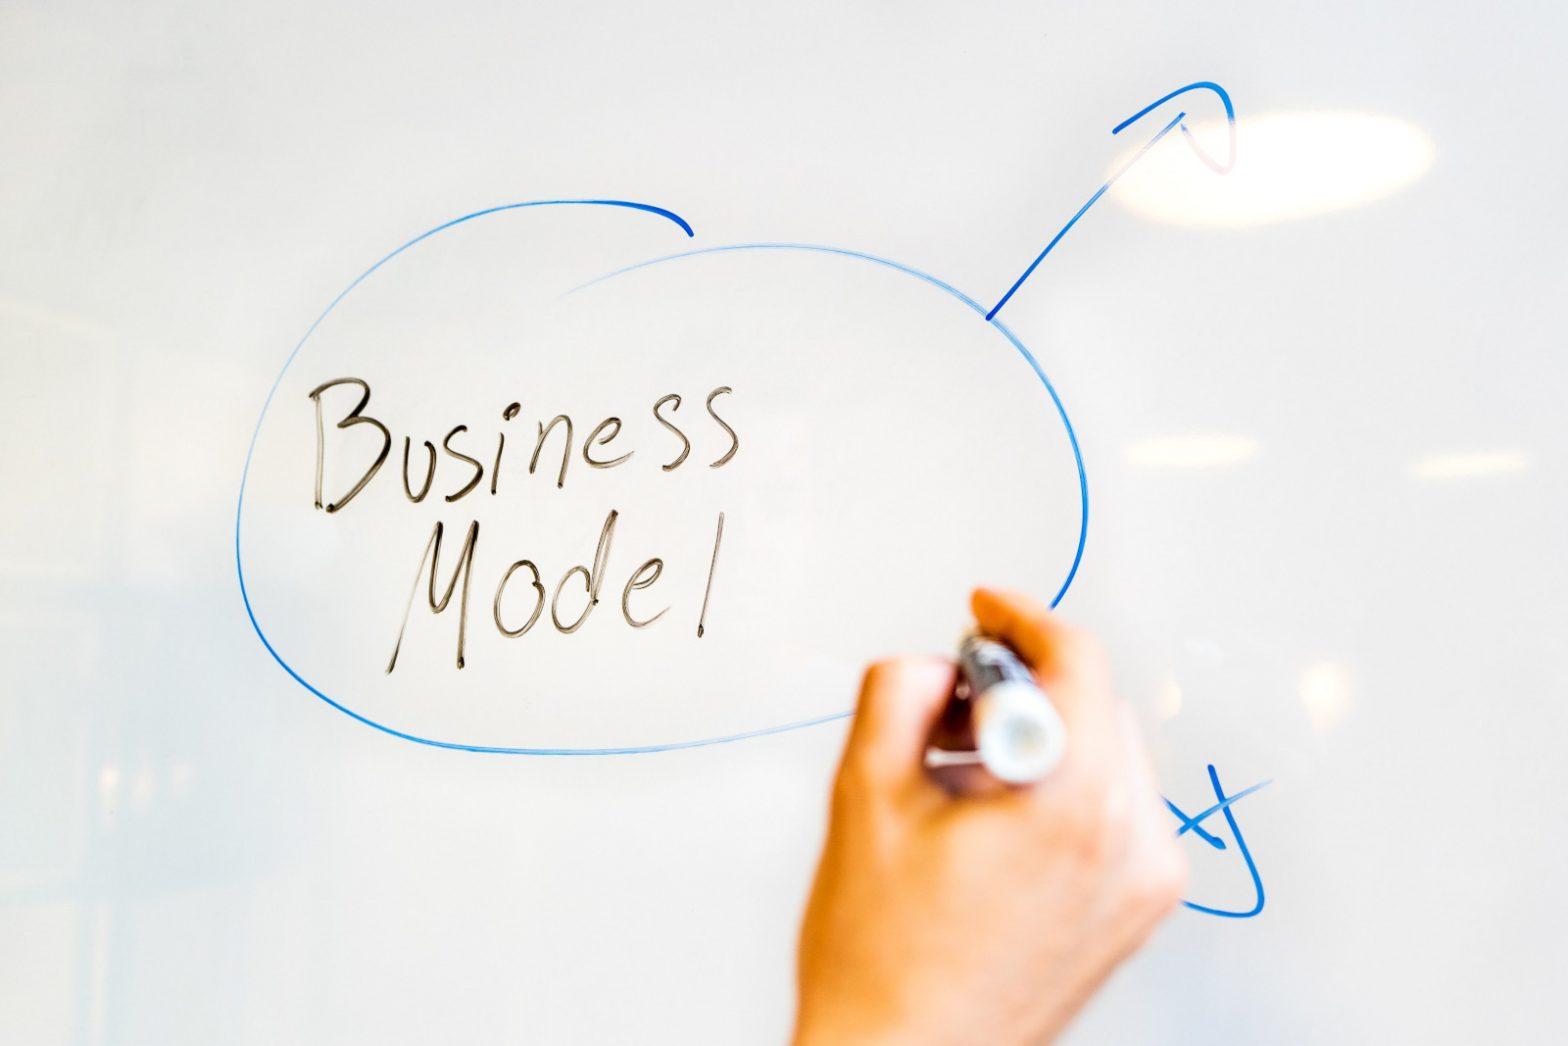 Business Model Whiteboard